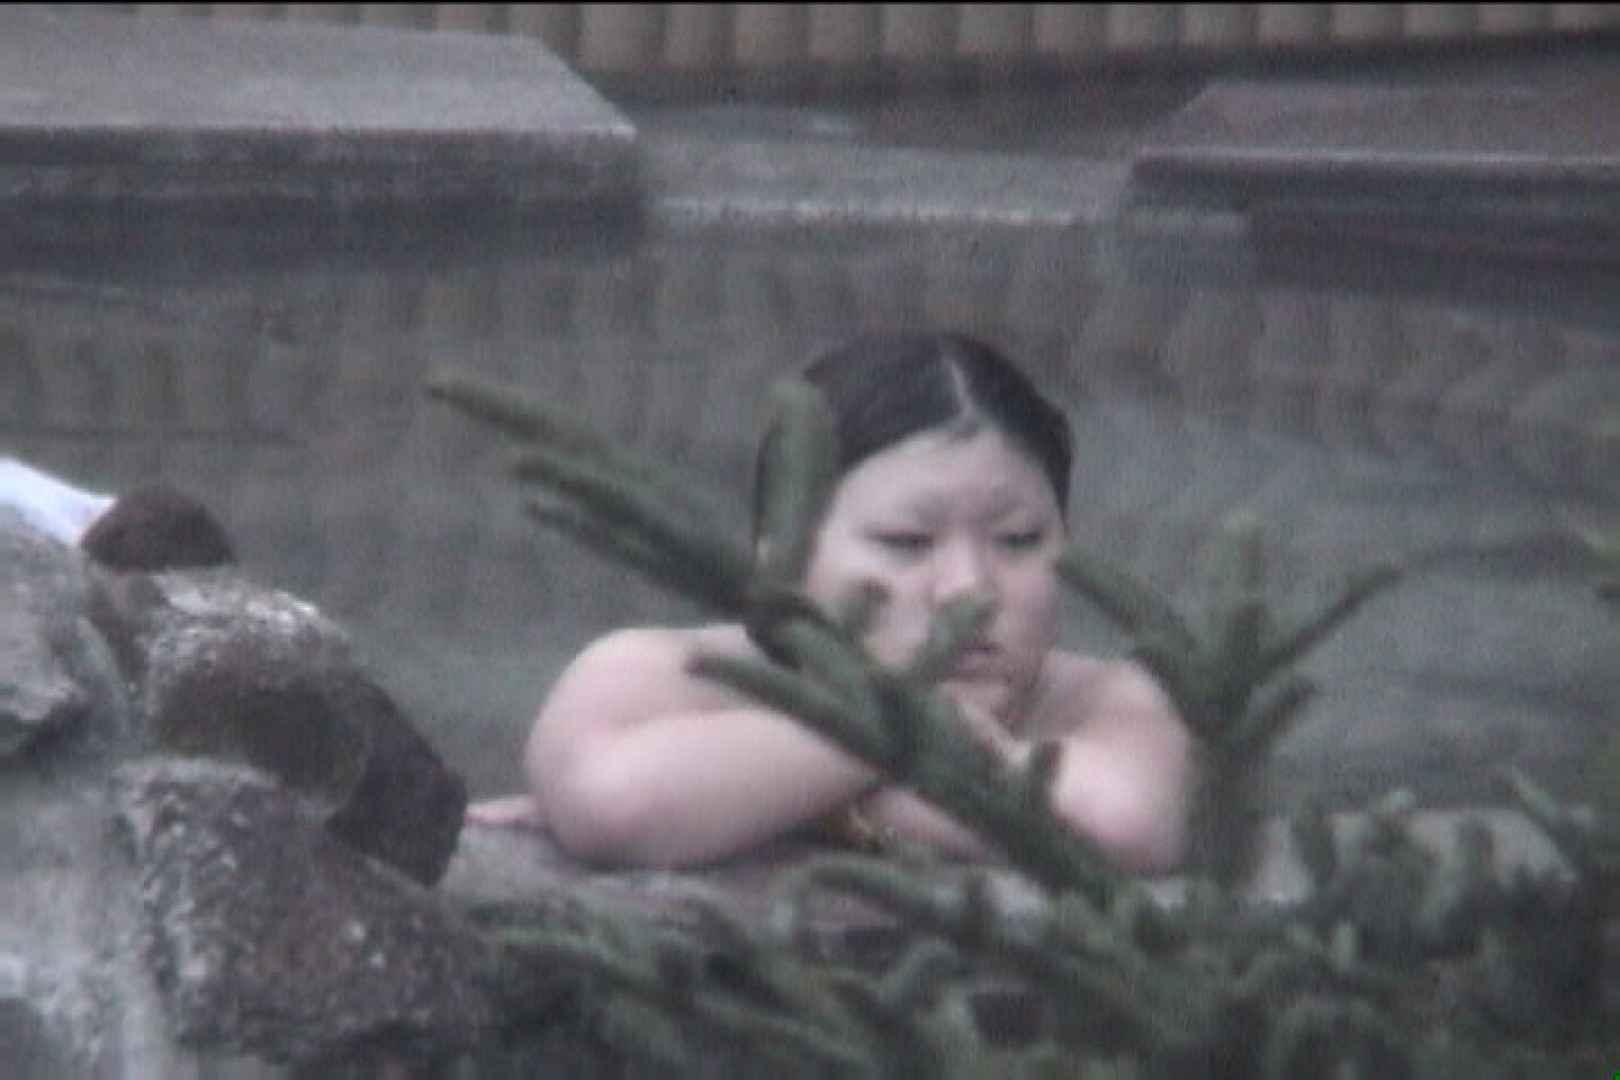 Aquaな露天風呂Vol.09 盗撮 | OLエロ画像  72PICs 25